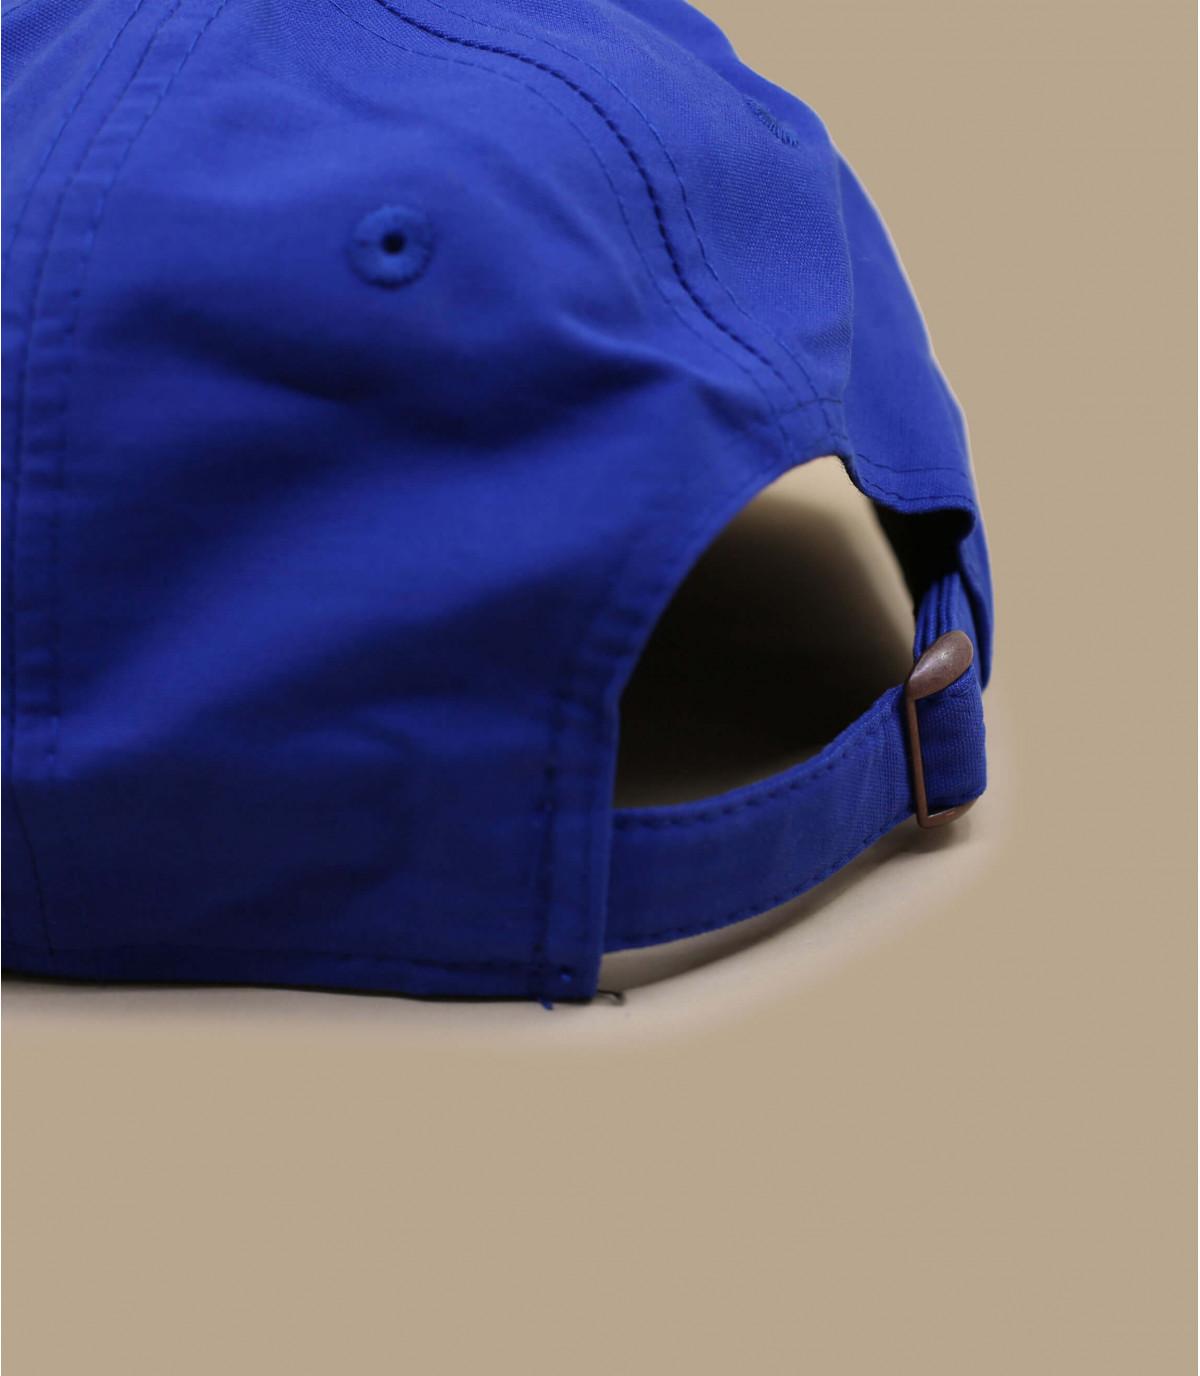 Details Cap Light Wight Nylon Packable 9Twenty LA royal butternut - Abbildung 3